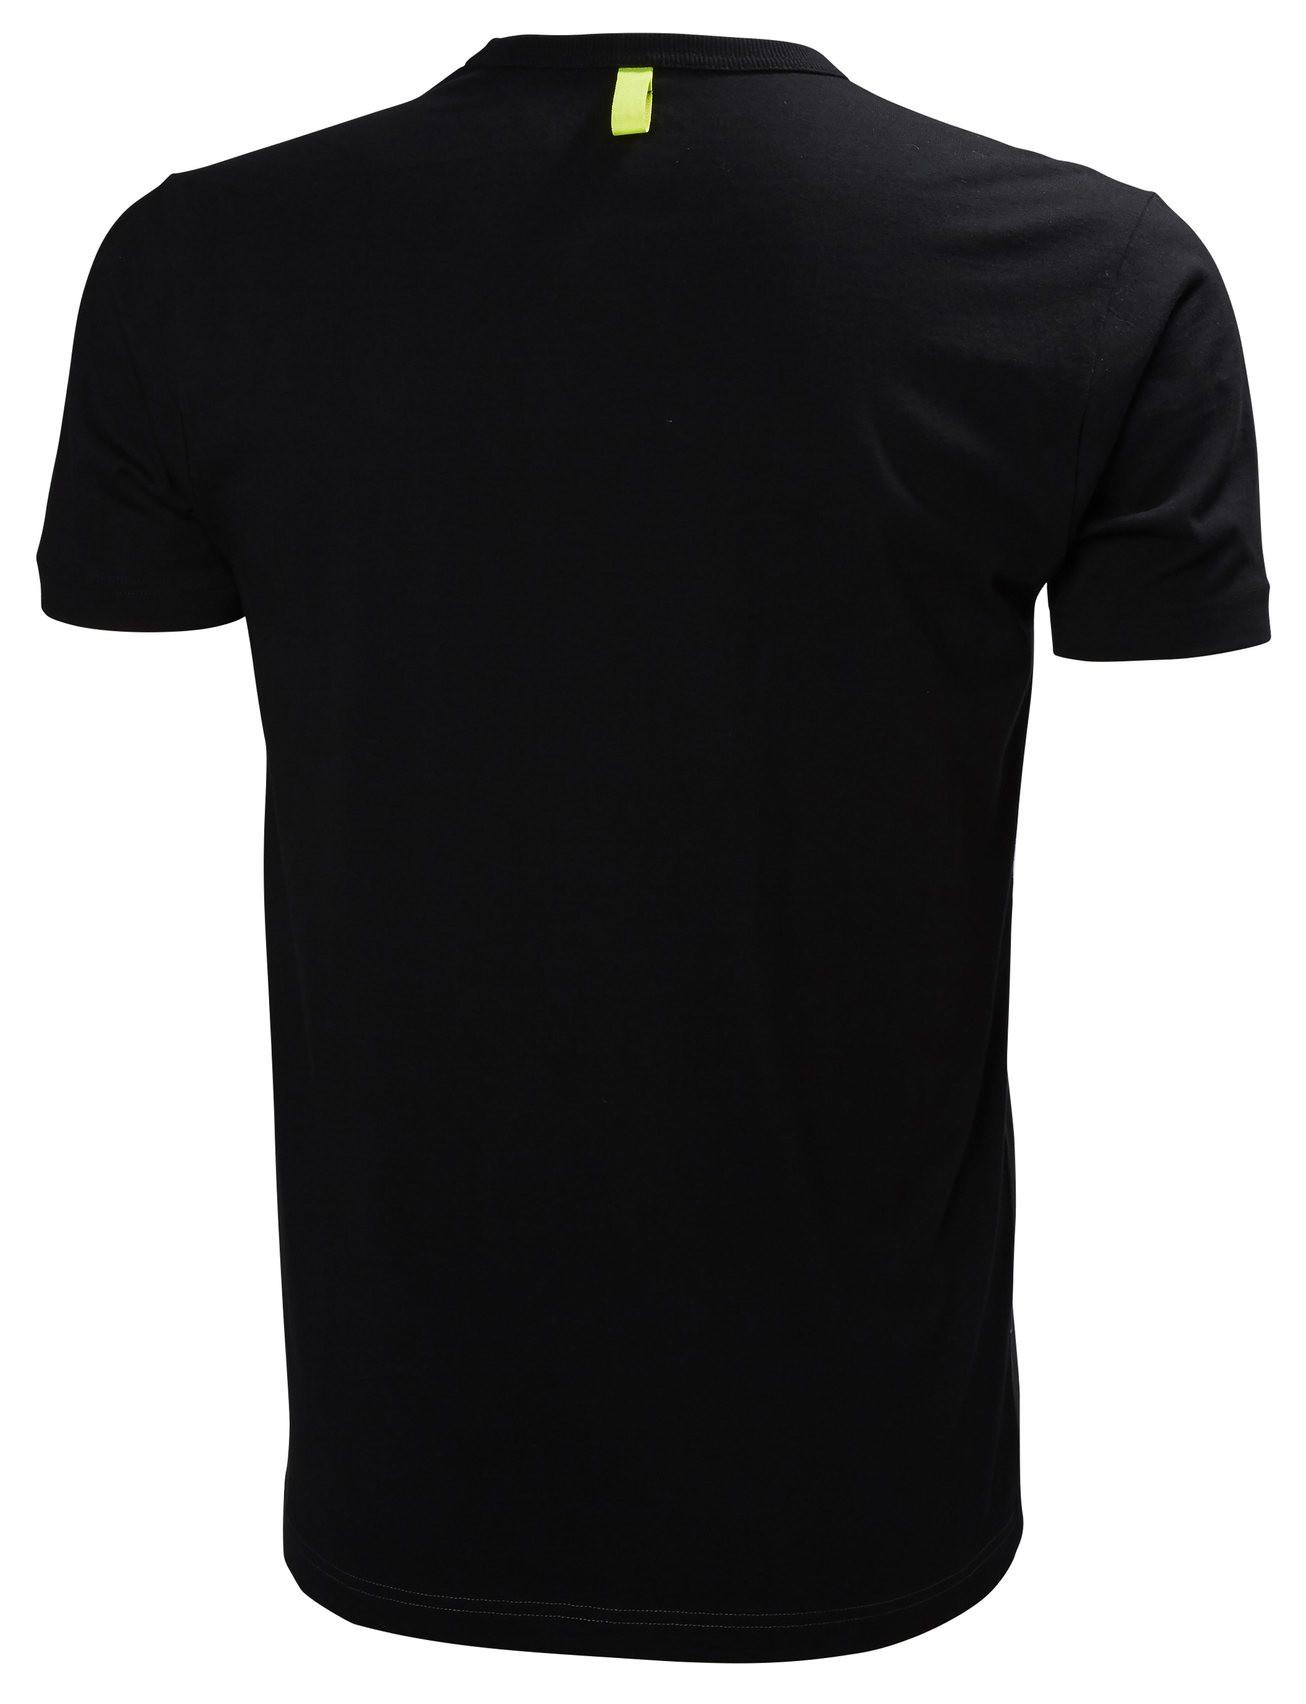 Футболка Helly Hansen Aker Tee - 79160 (Black; L)